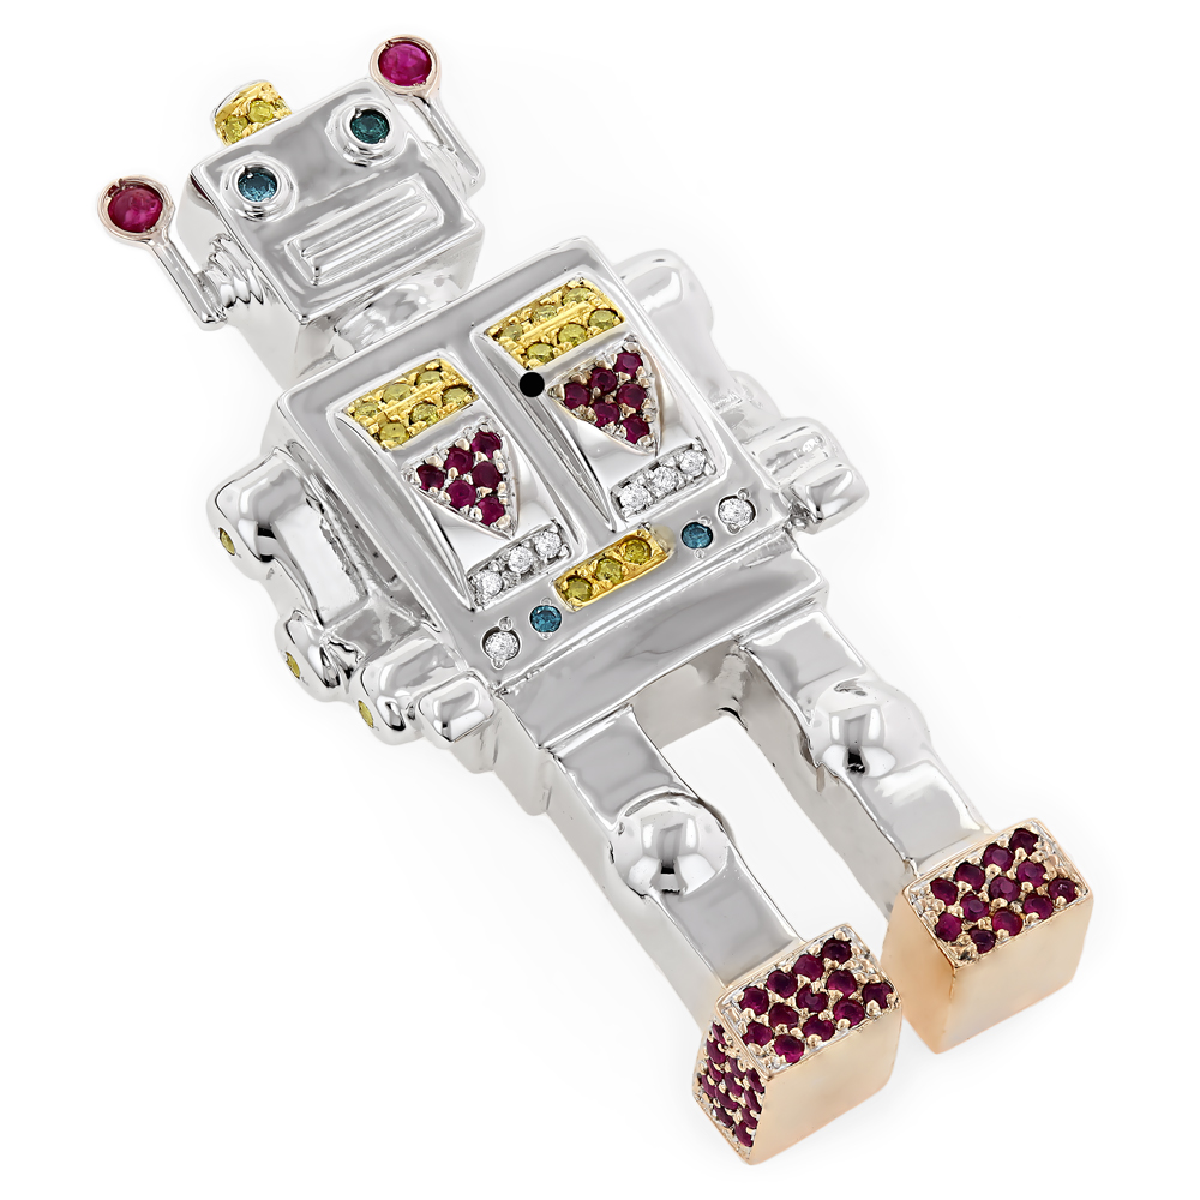 Gold Diamond Robot Pendant 14K Custom Made Jewelry